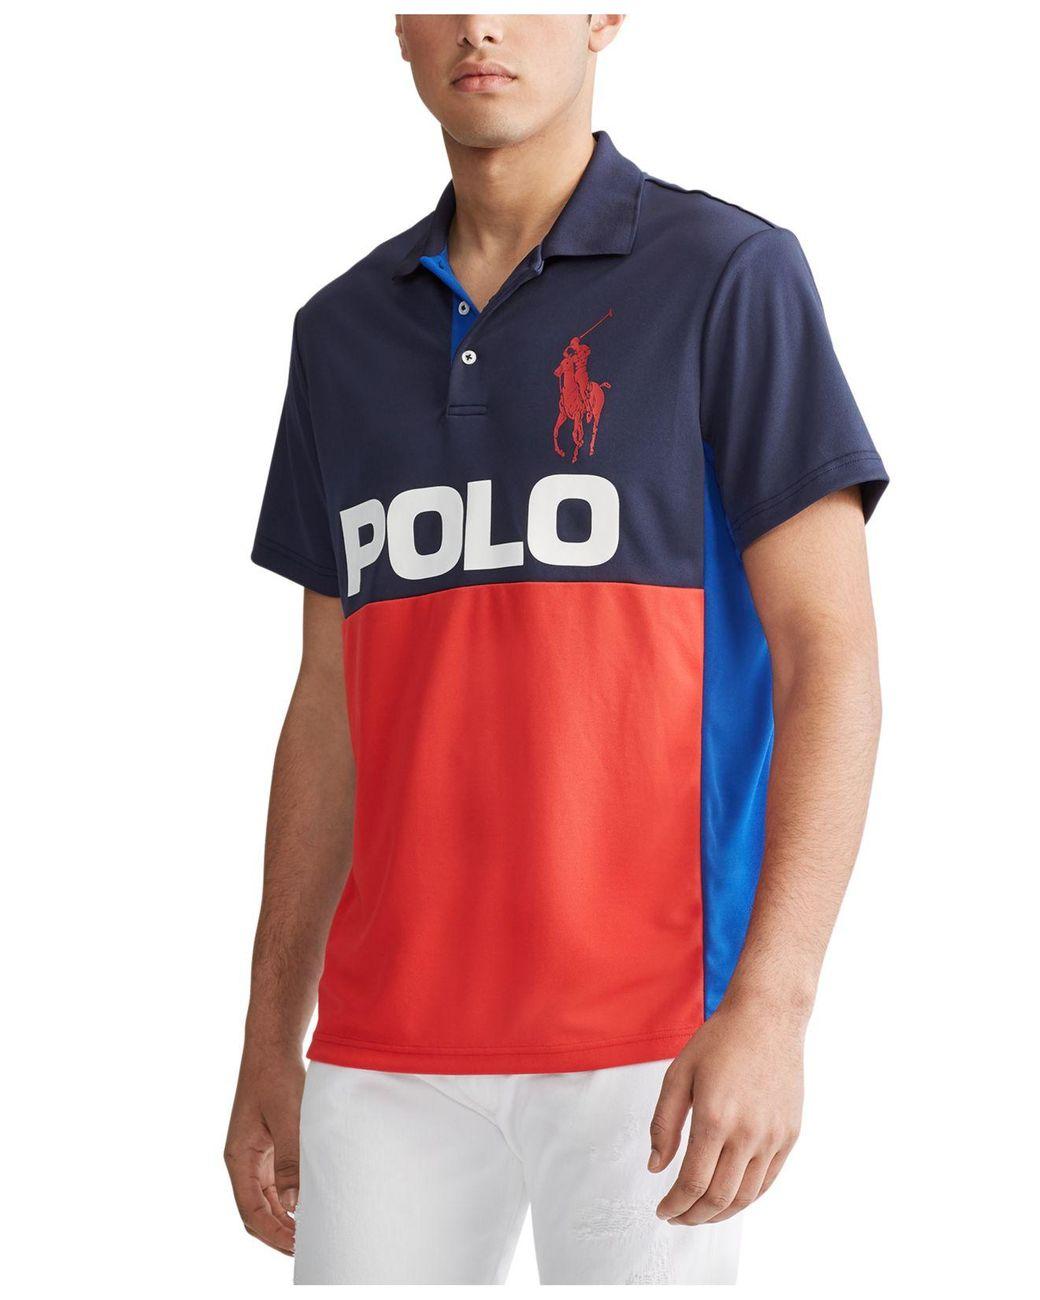 NEW Polo Ralph Lauren Big and Tall Big Pony Performance Sweat Wicking Polo Shirt